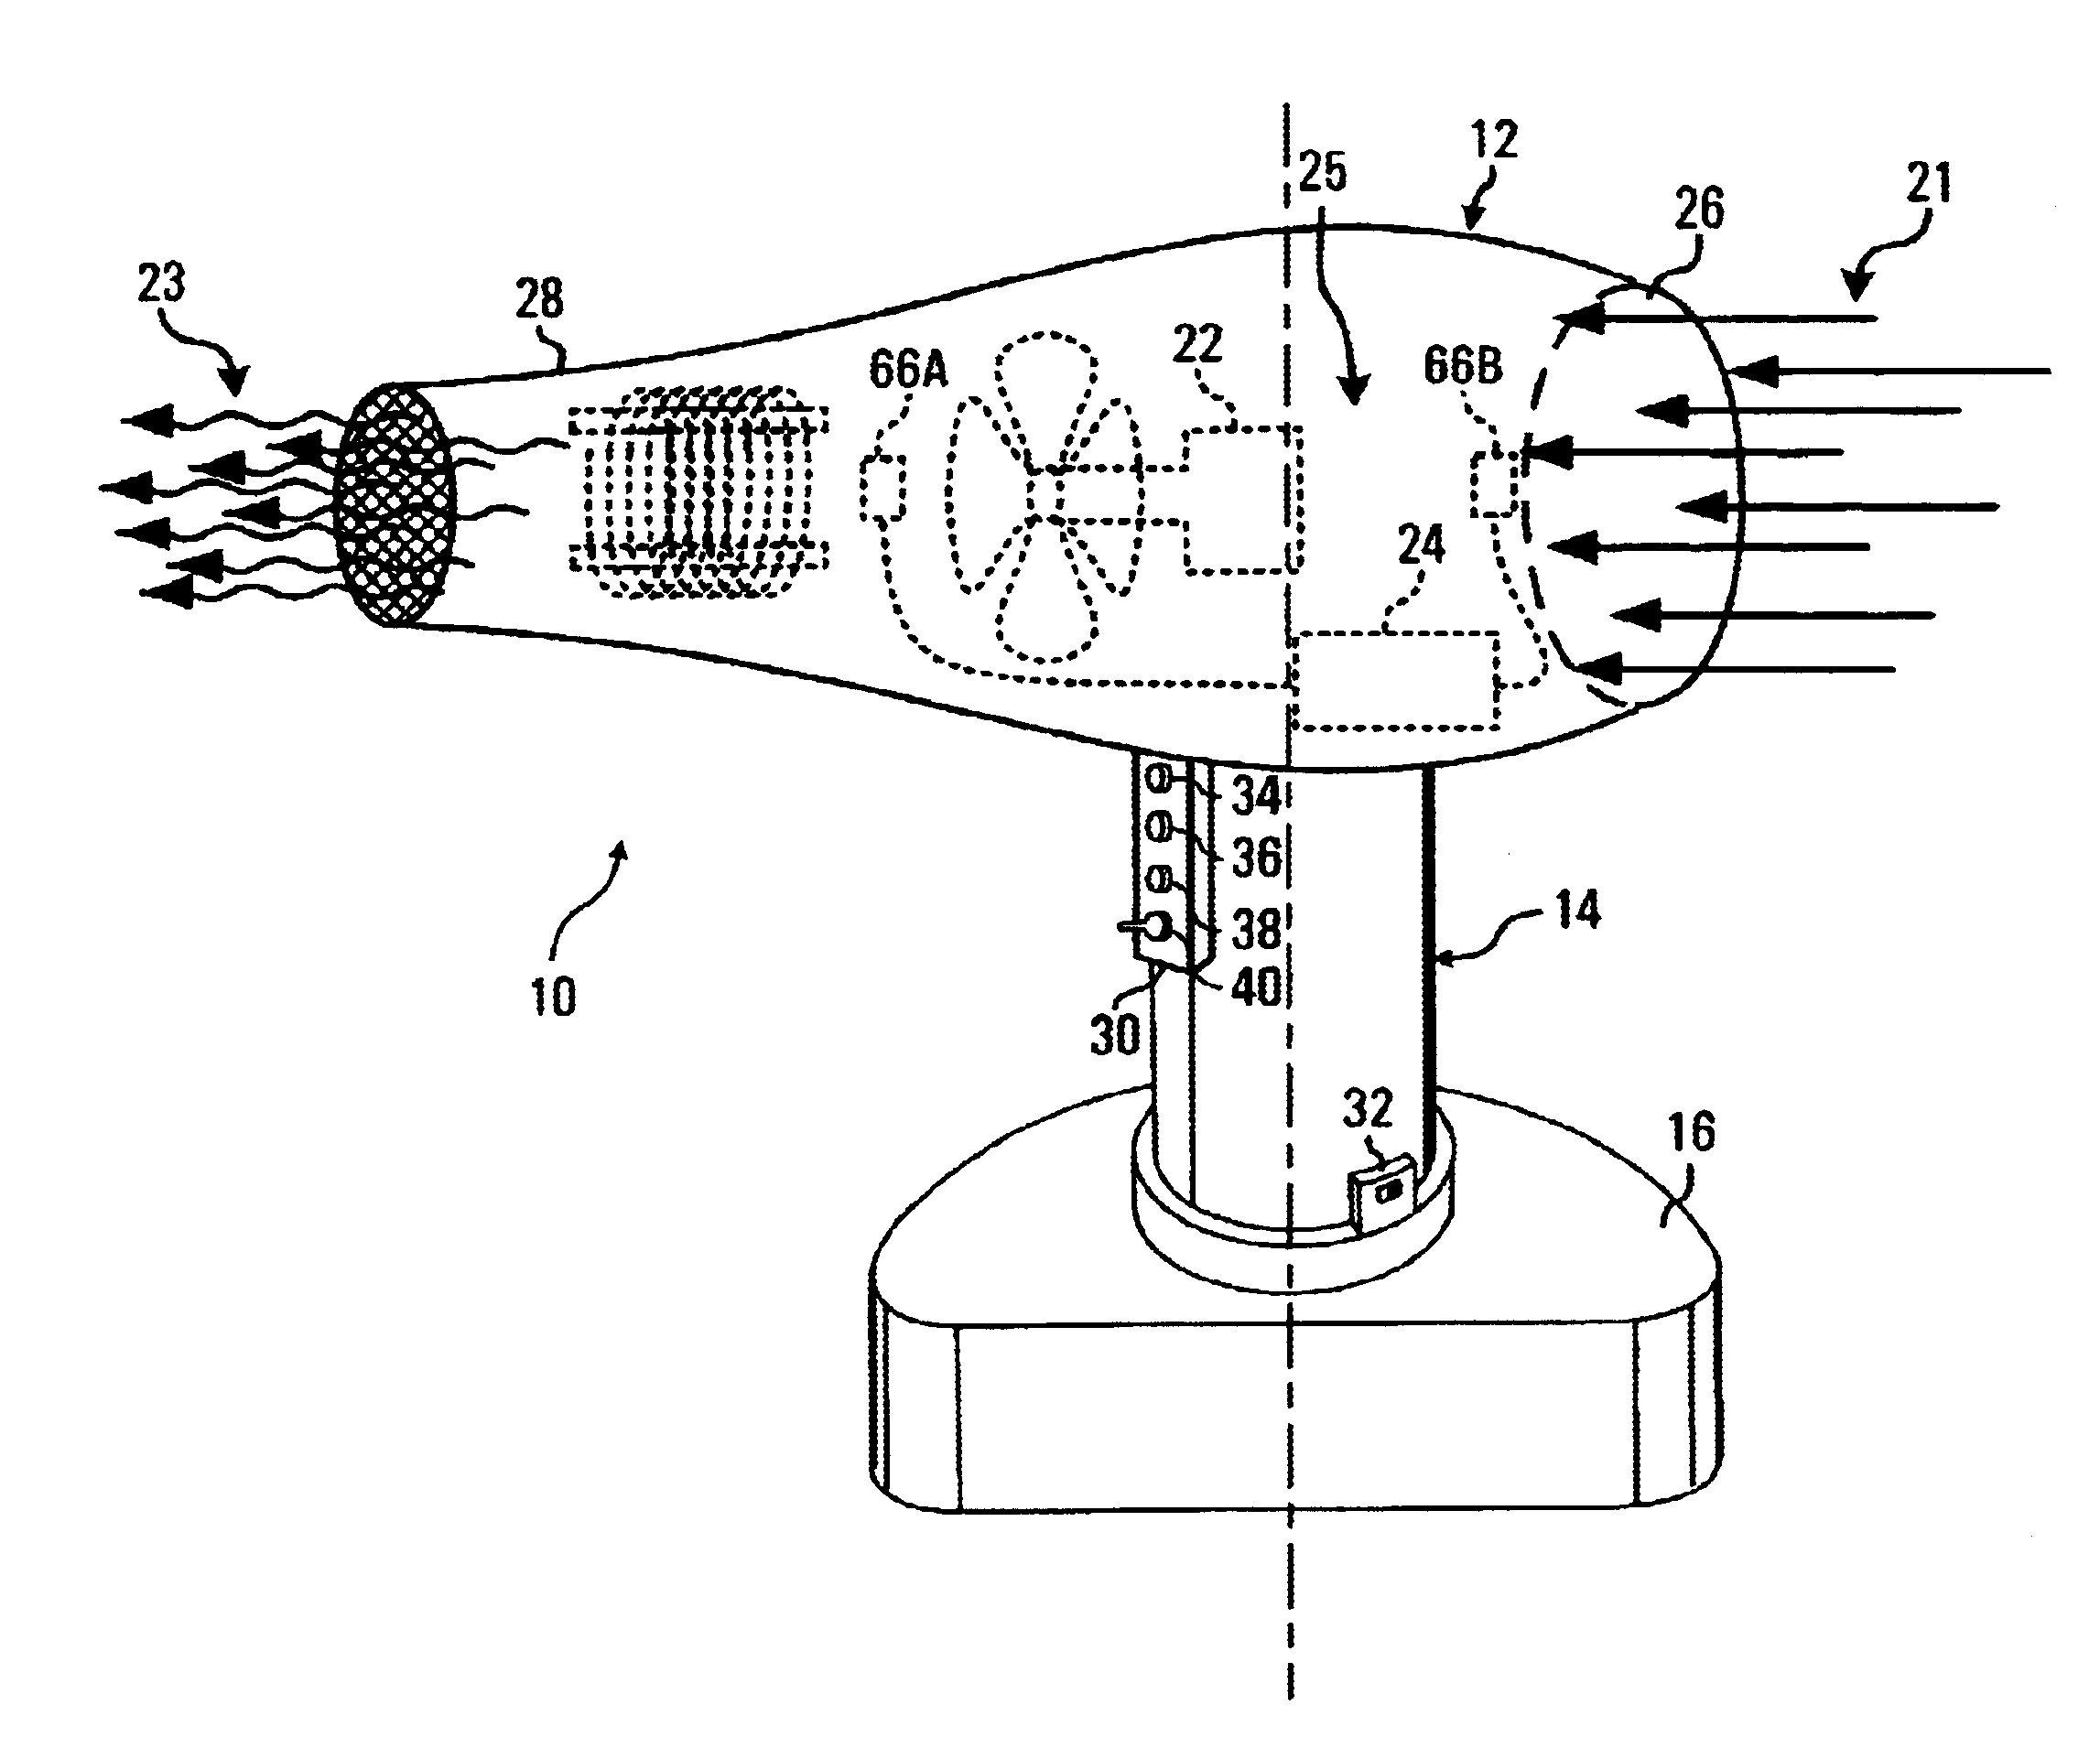 patent us  patent us � diagrams wiring 3 prong plug diagram